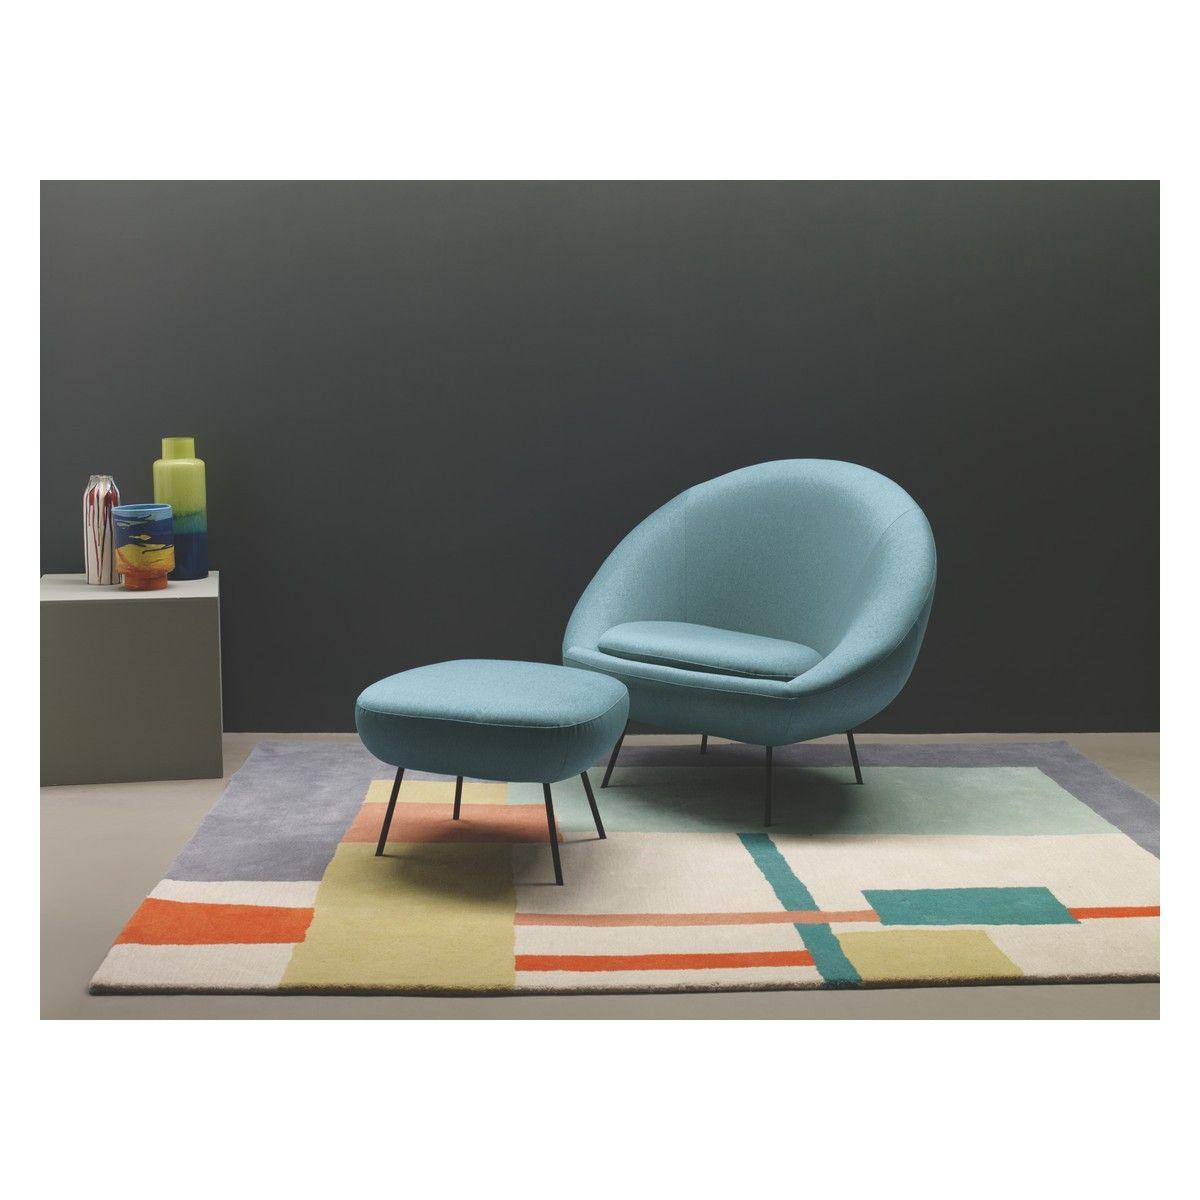 Hallway furniture habitat  MISTY Teal blue fabric armchair  Fabric armchairs Blue fabric and